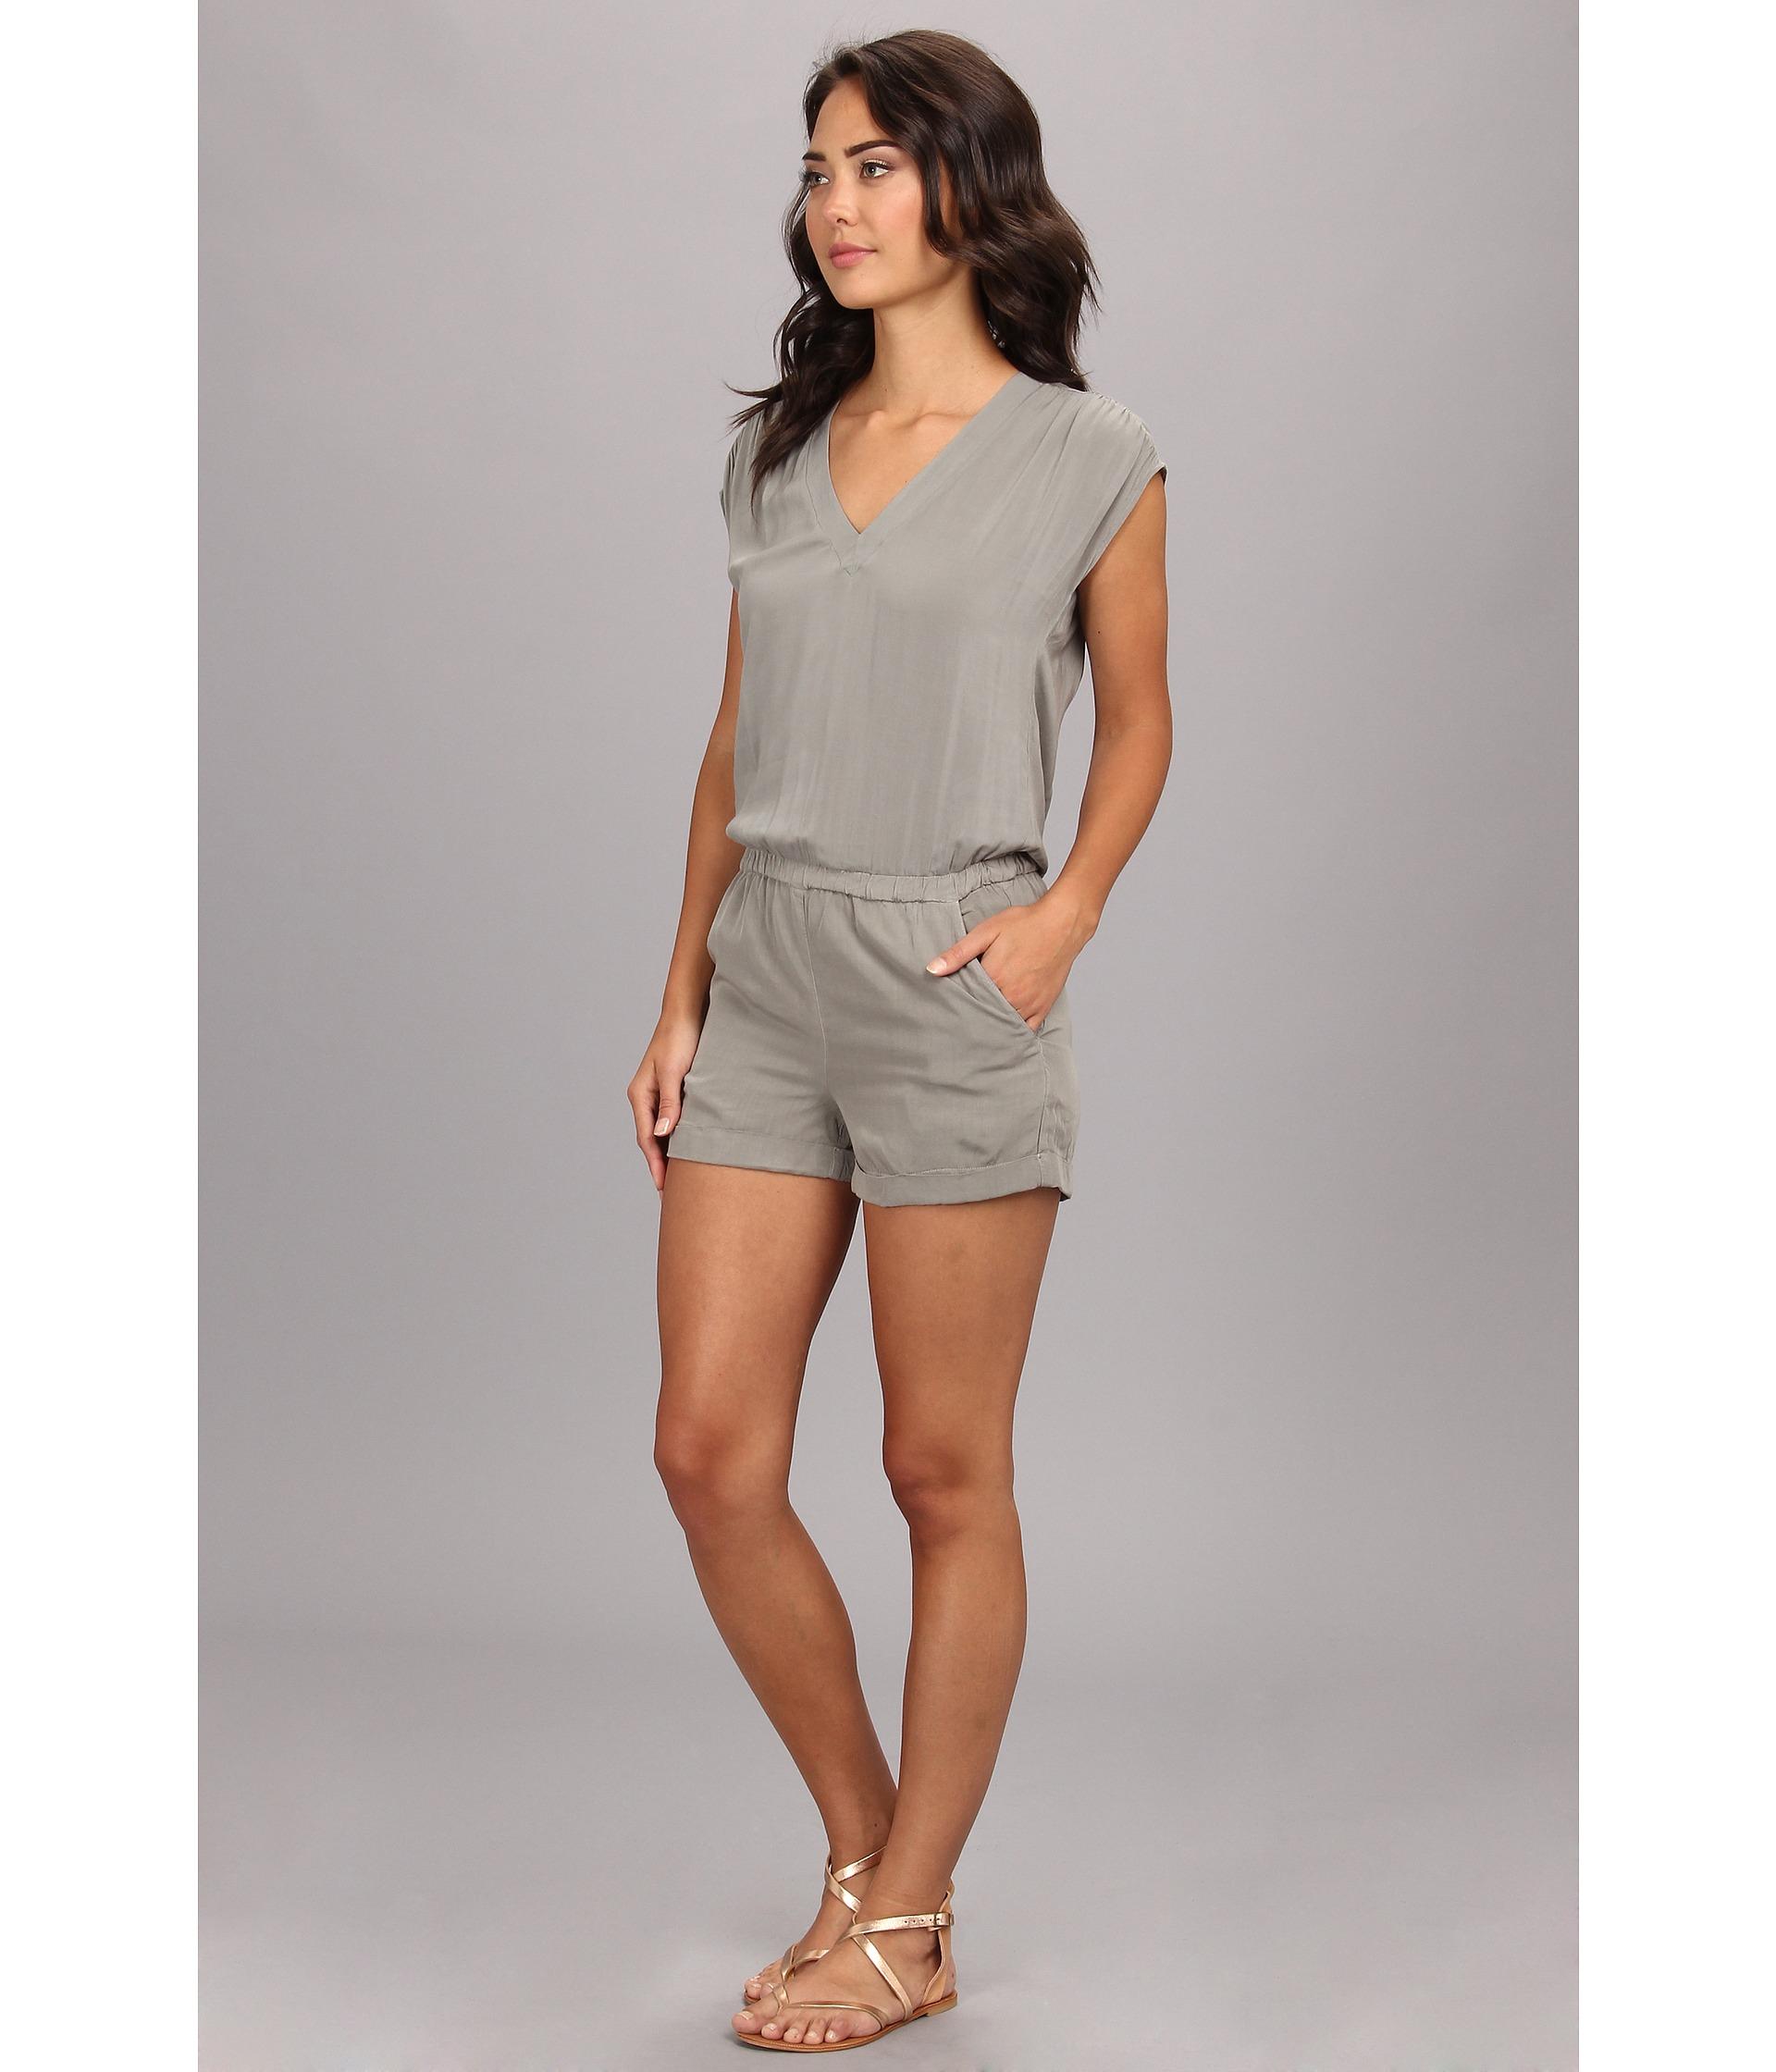 91ac783ba40 Lyst - Splendid Short Romper in Gray